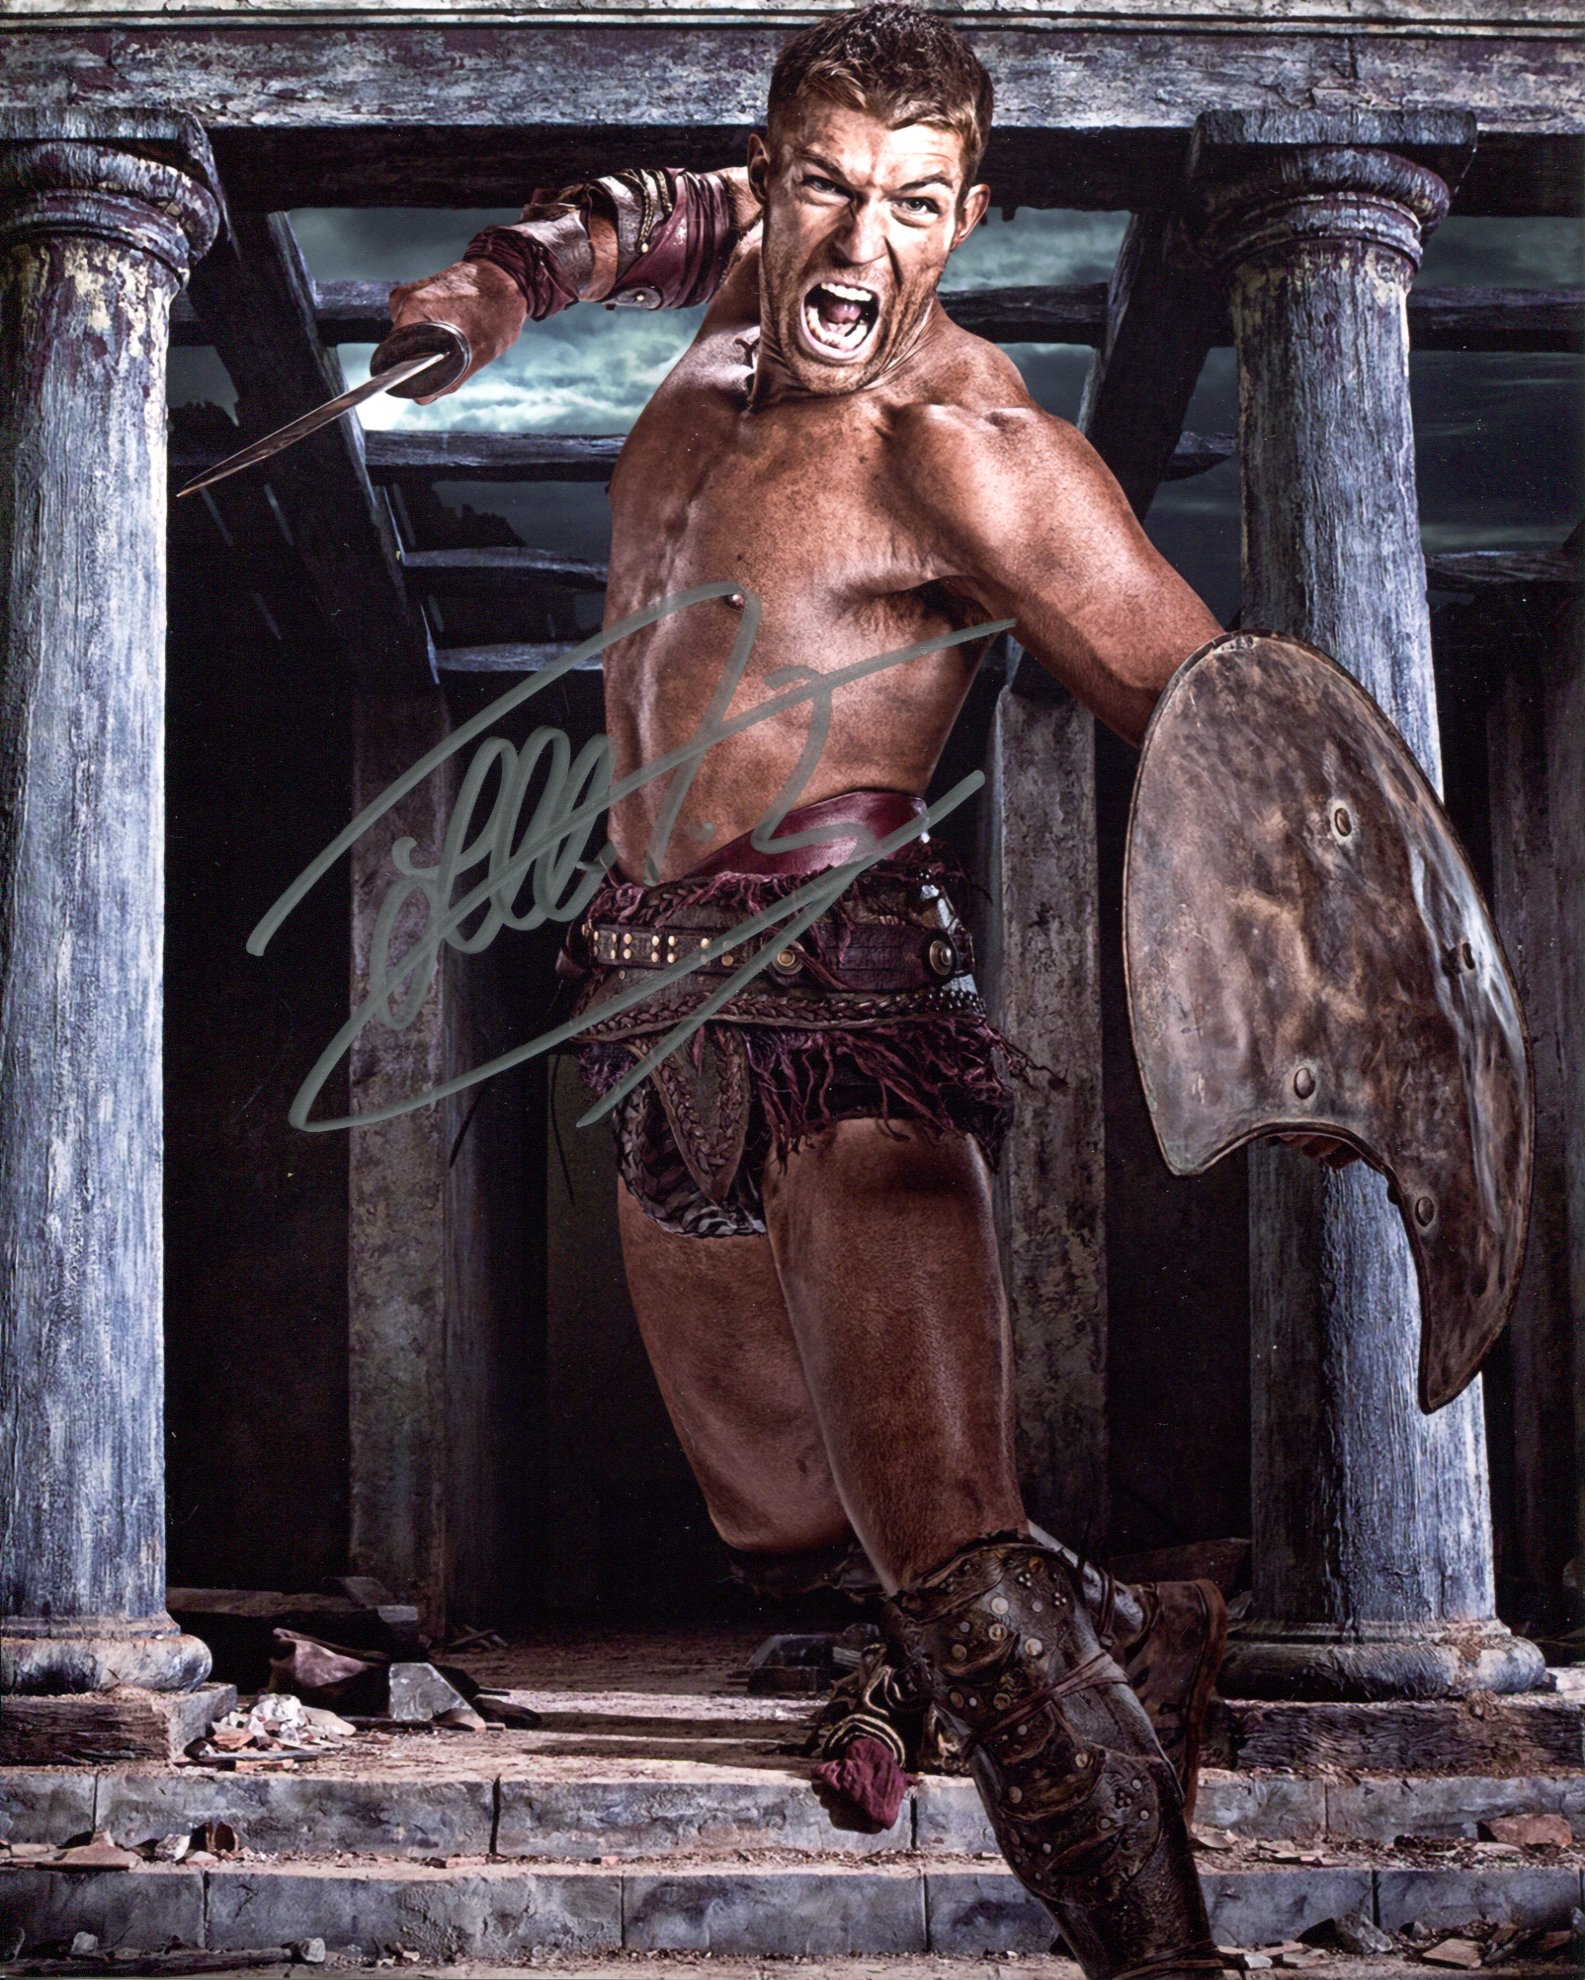 Spartacus 8x10 Spartacus TV series photo signed by Spartacus himself, actor Liam McIntyre. Good